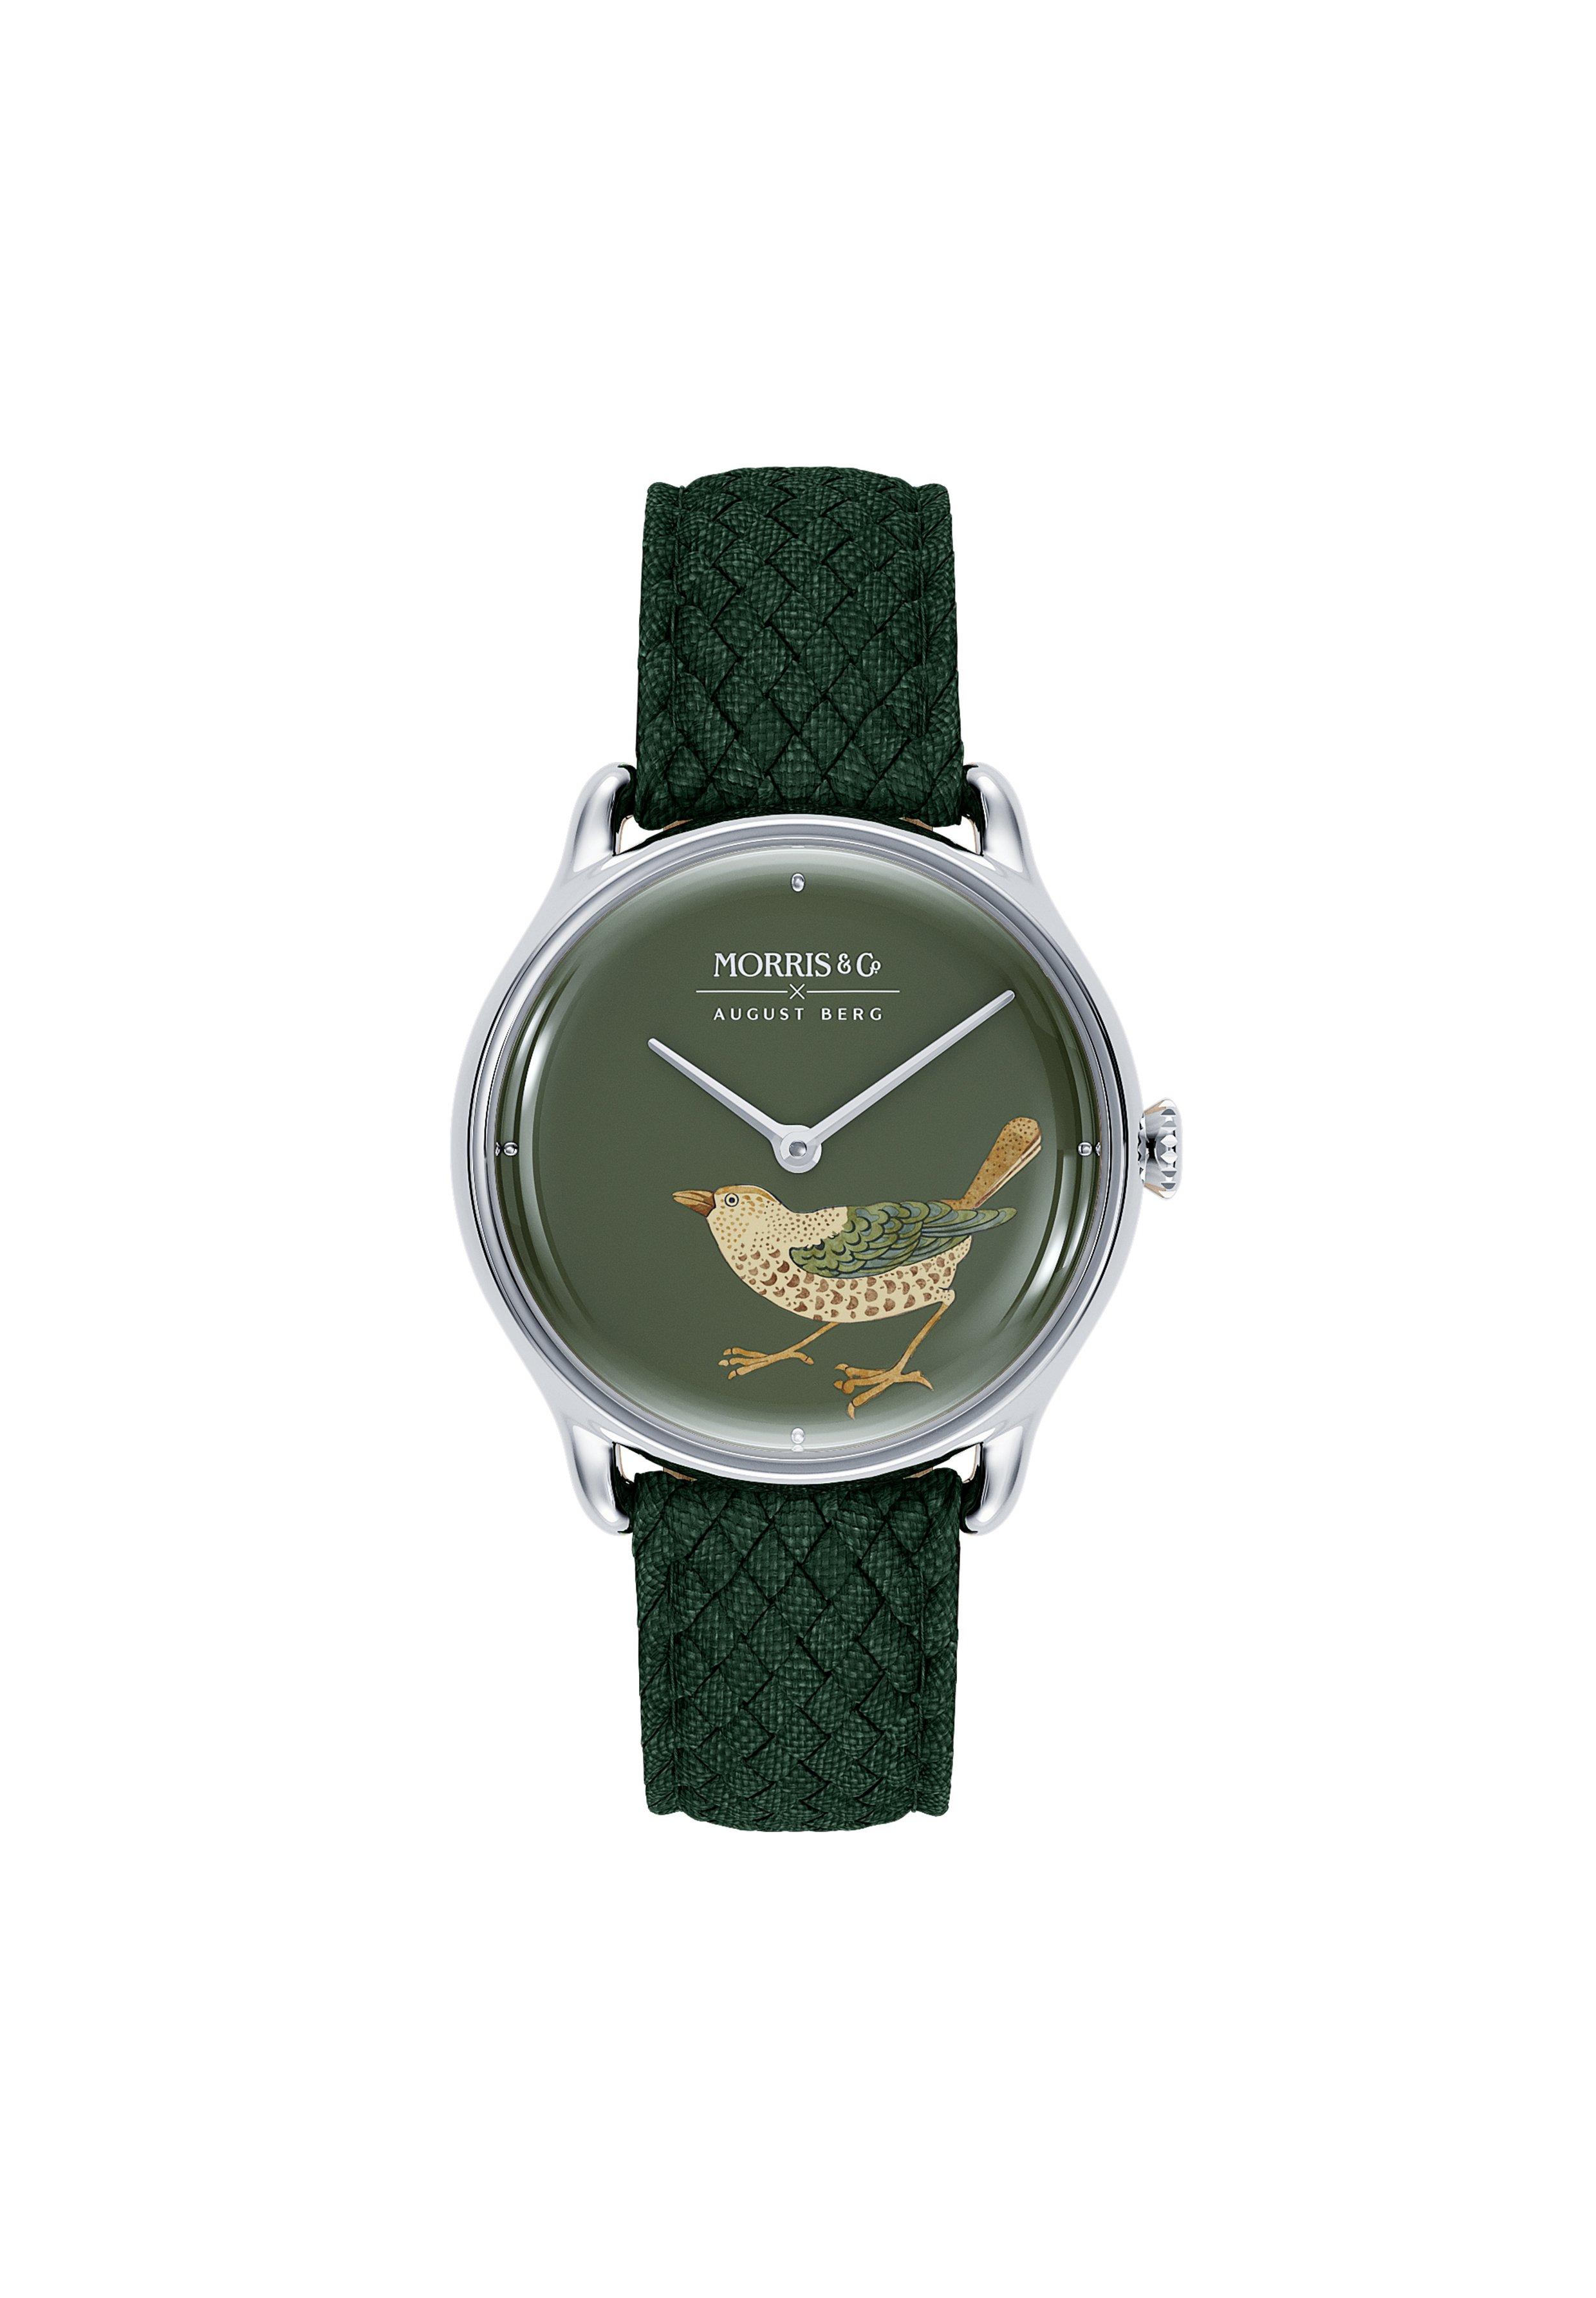 Homme UHR MORRIS & CO SILVER BIRD GREEN PERLON 30MM - Montre